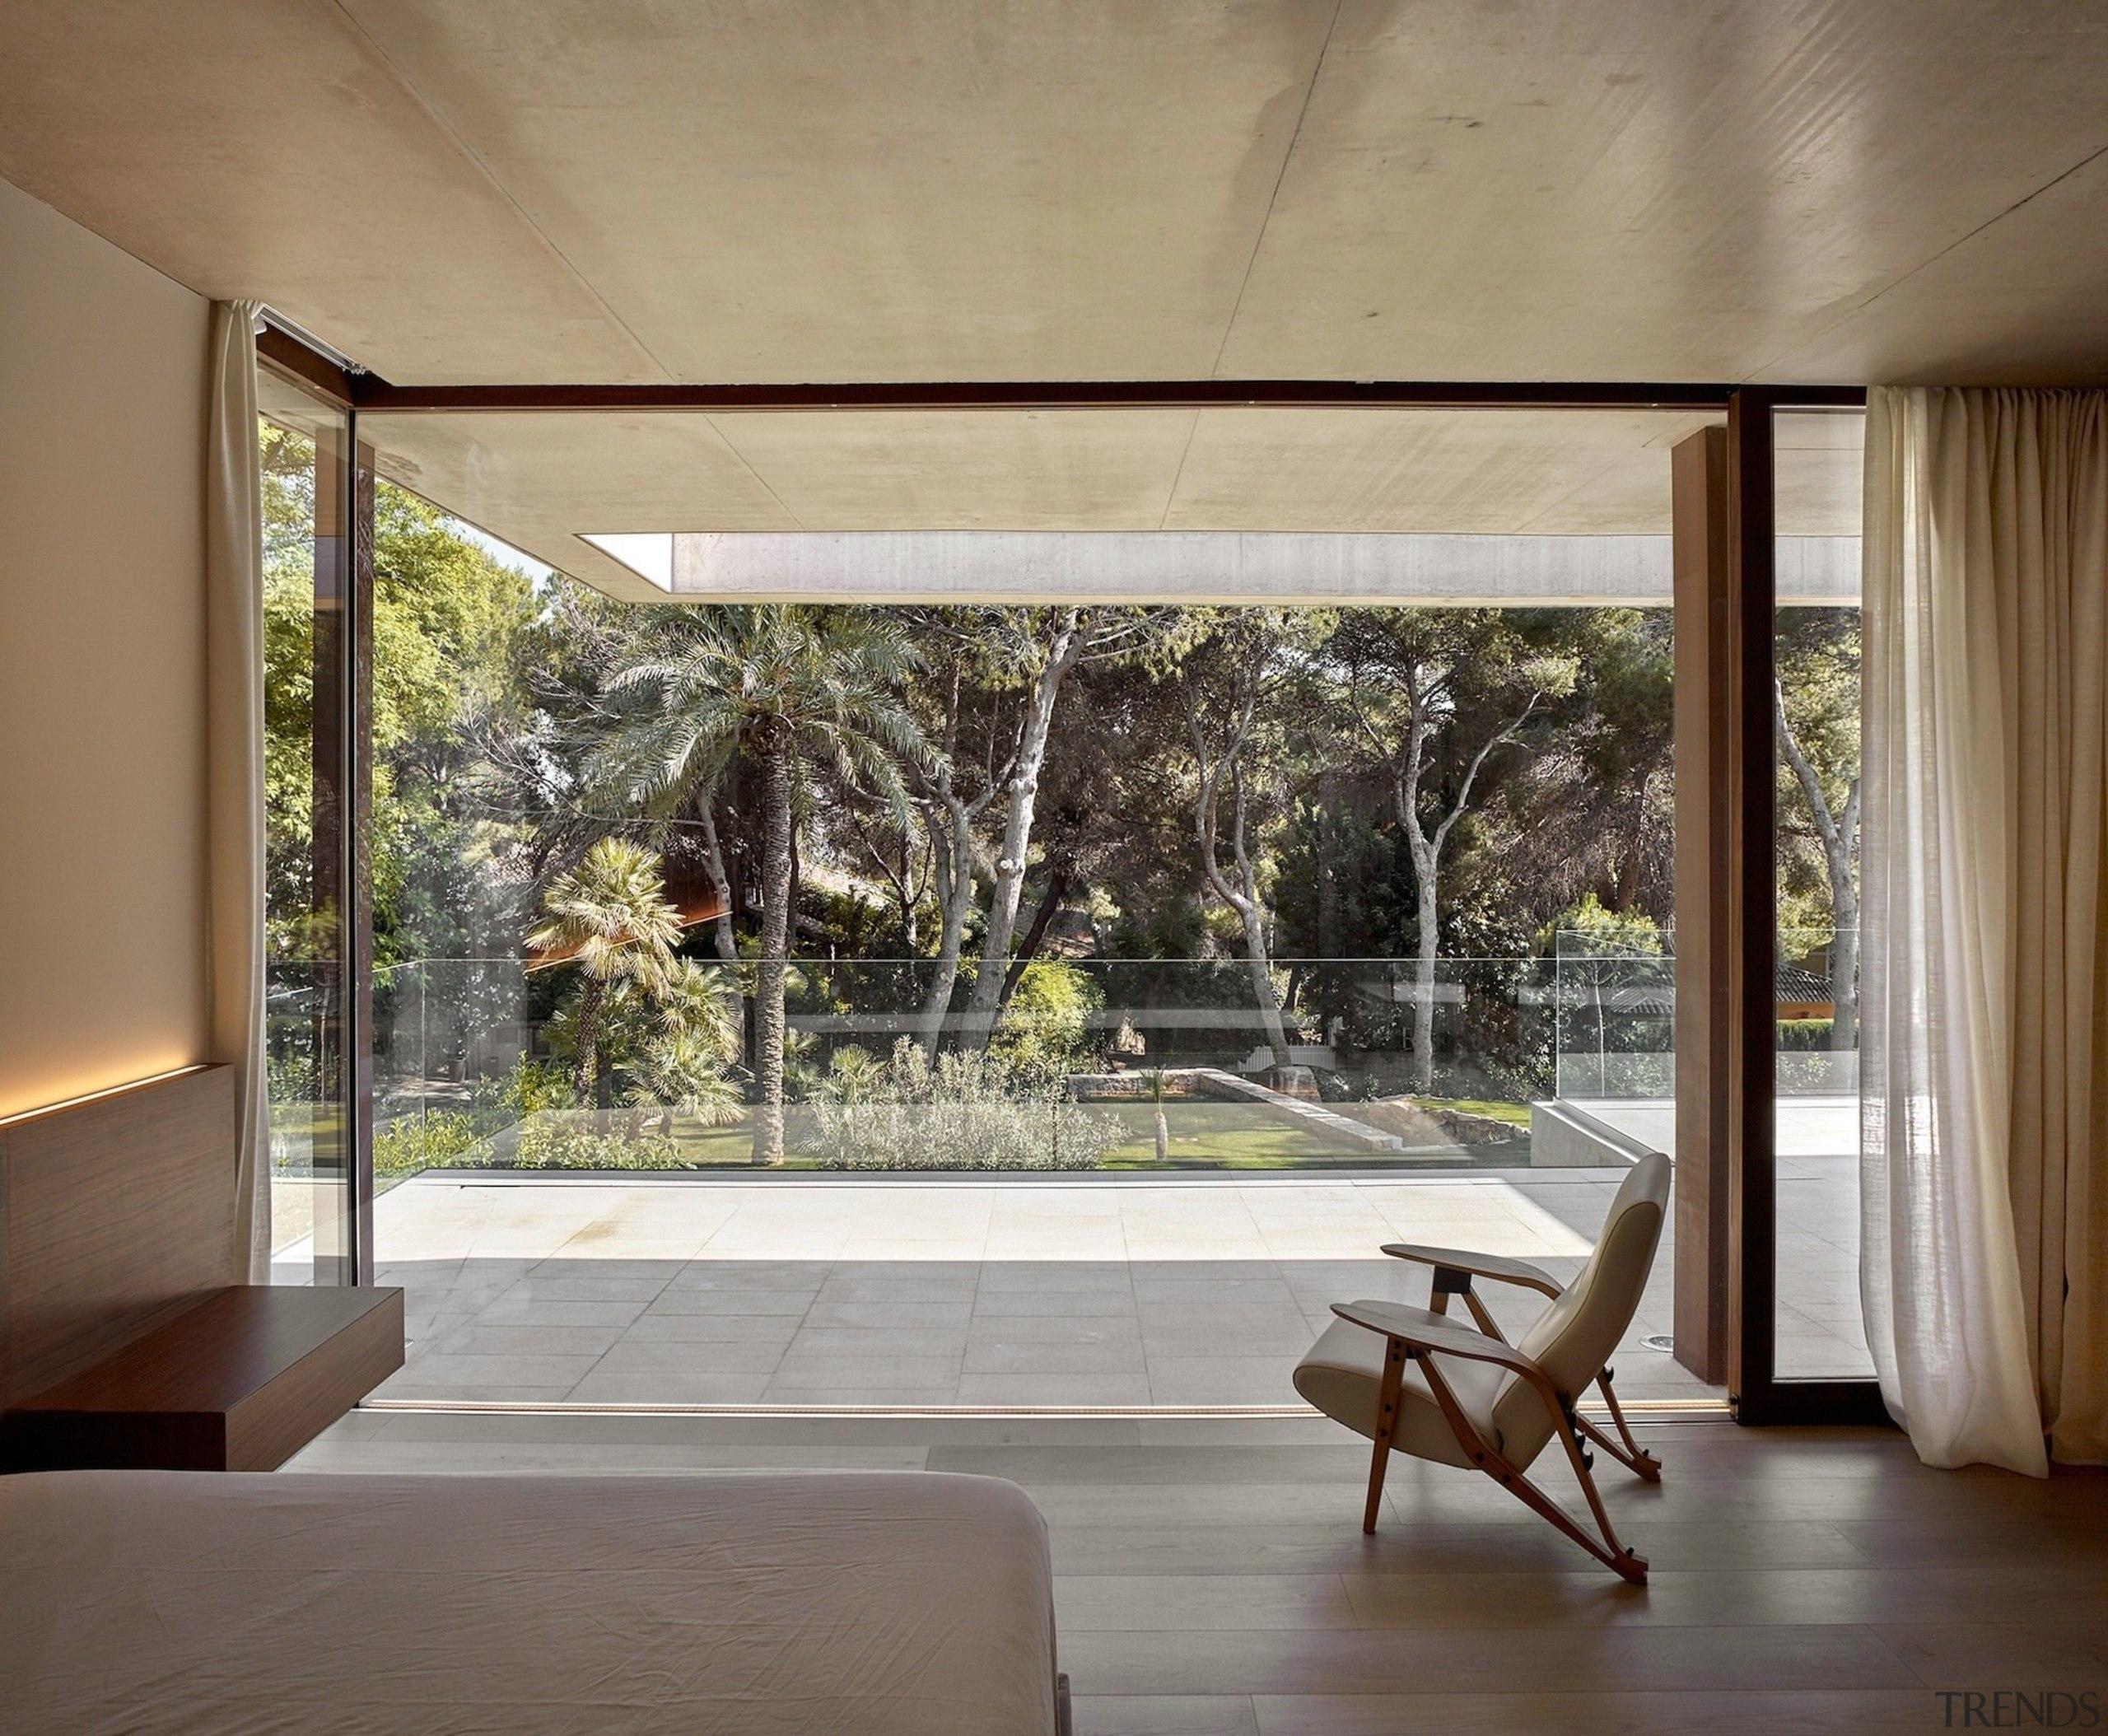 Architect: Ramón Esteve Estudio de Arquitectura architecture, door, estate, home, house, interior design, living room, real estate, shade, window, gray, brown